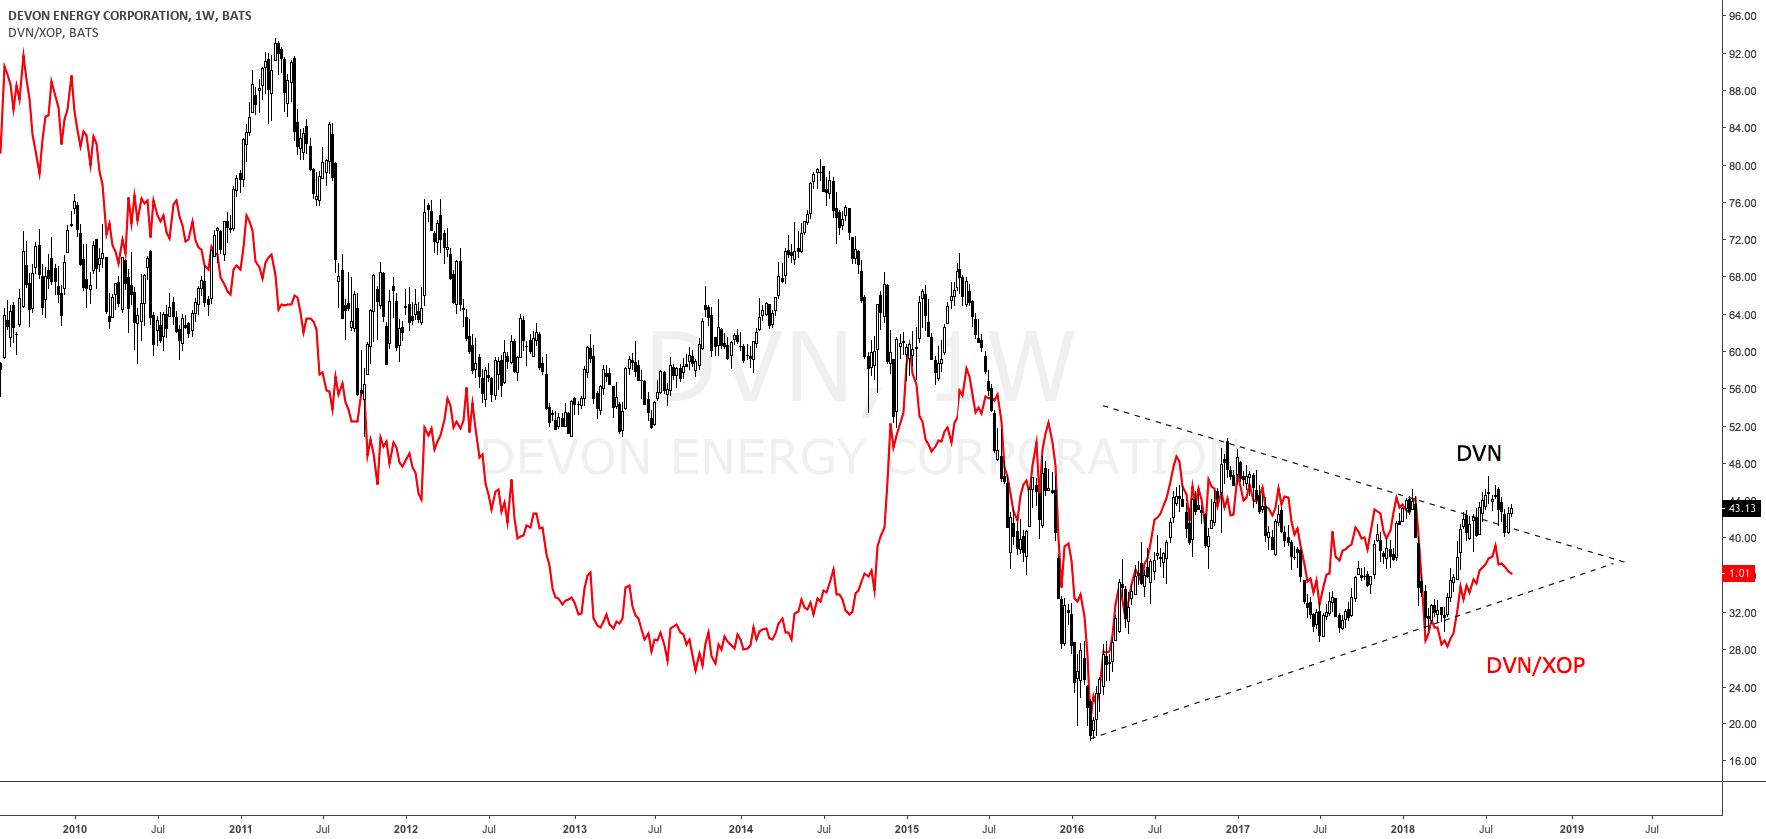 Devon Energy - Next Target: $50 - Devon Energy Corporation (NYSE:DVN